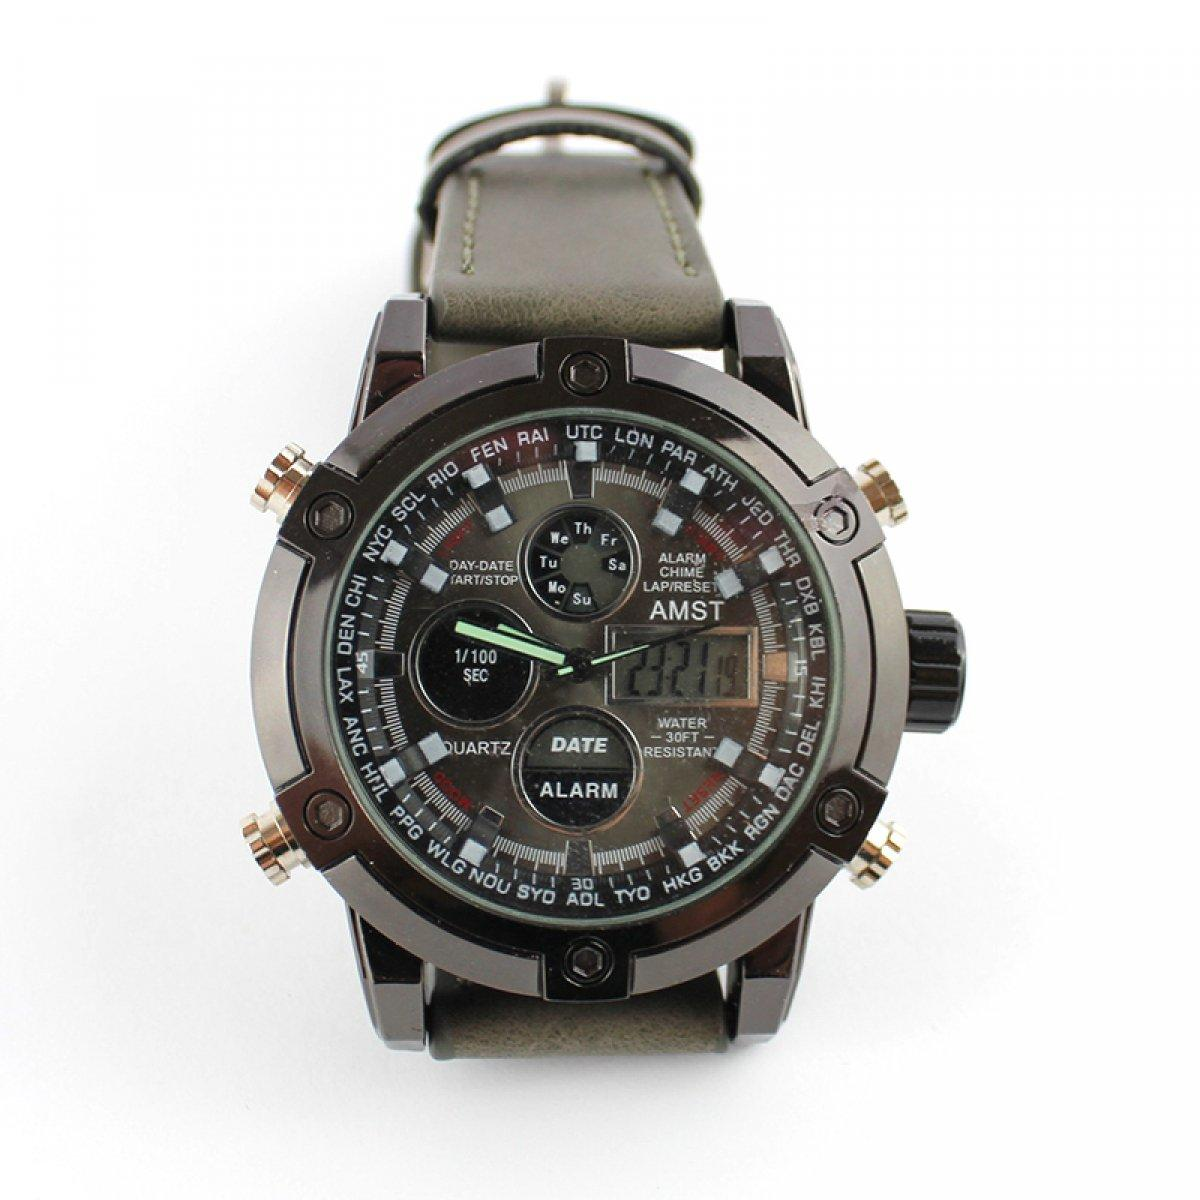 7e56f072 Кварцевые часы Amst watch AM3022 - 131811: продажа, цена, Полтава ...